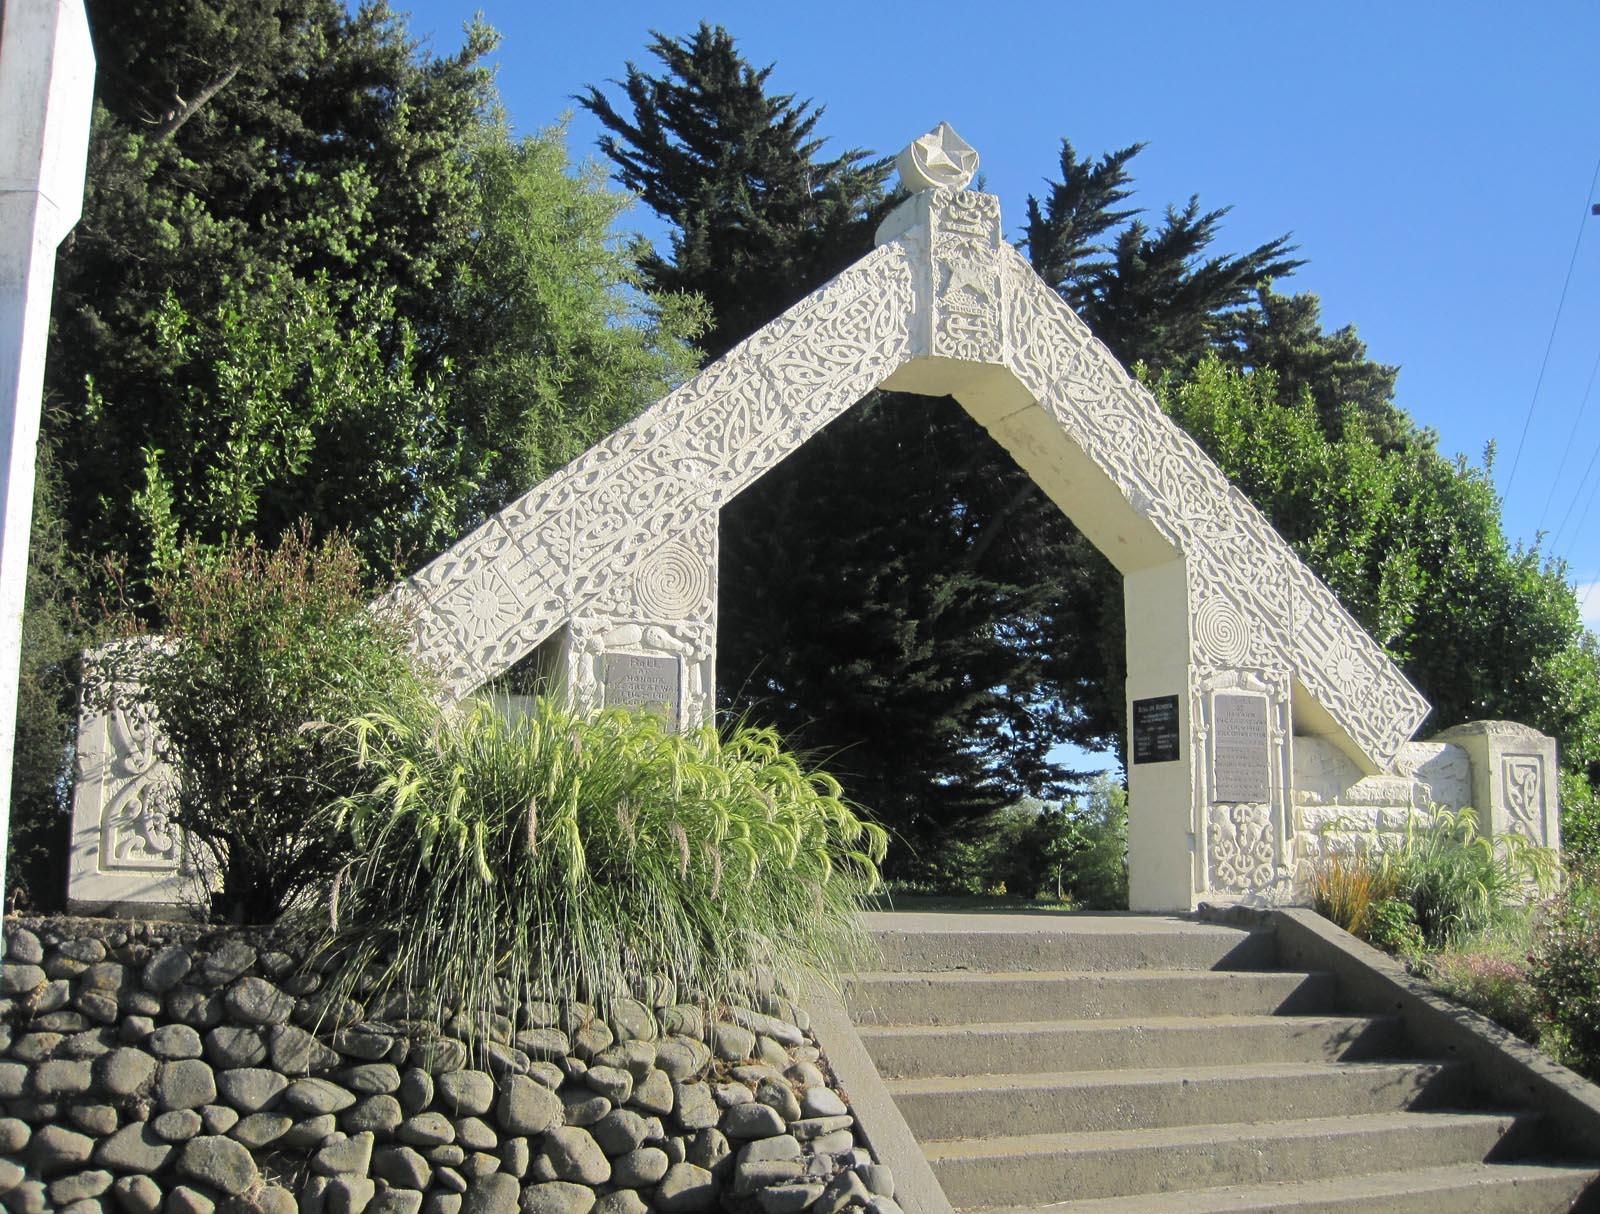 Arowhenua War Memorial